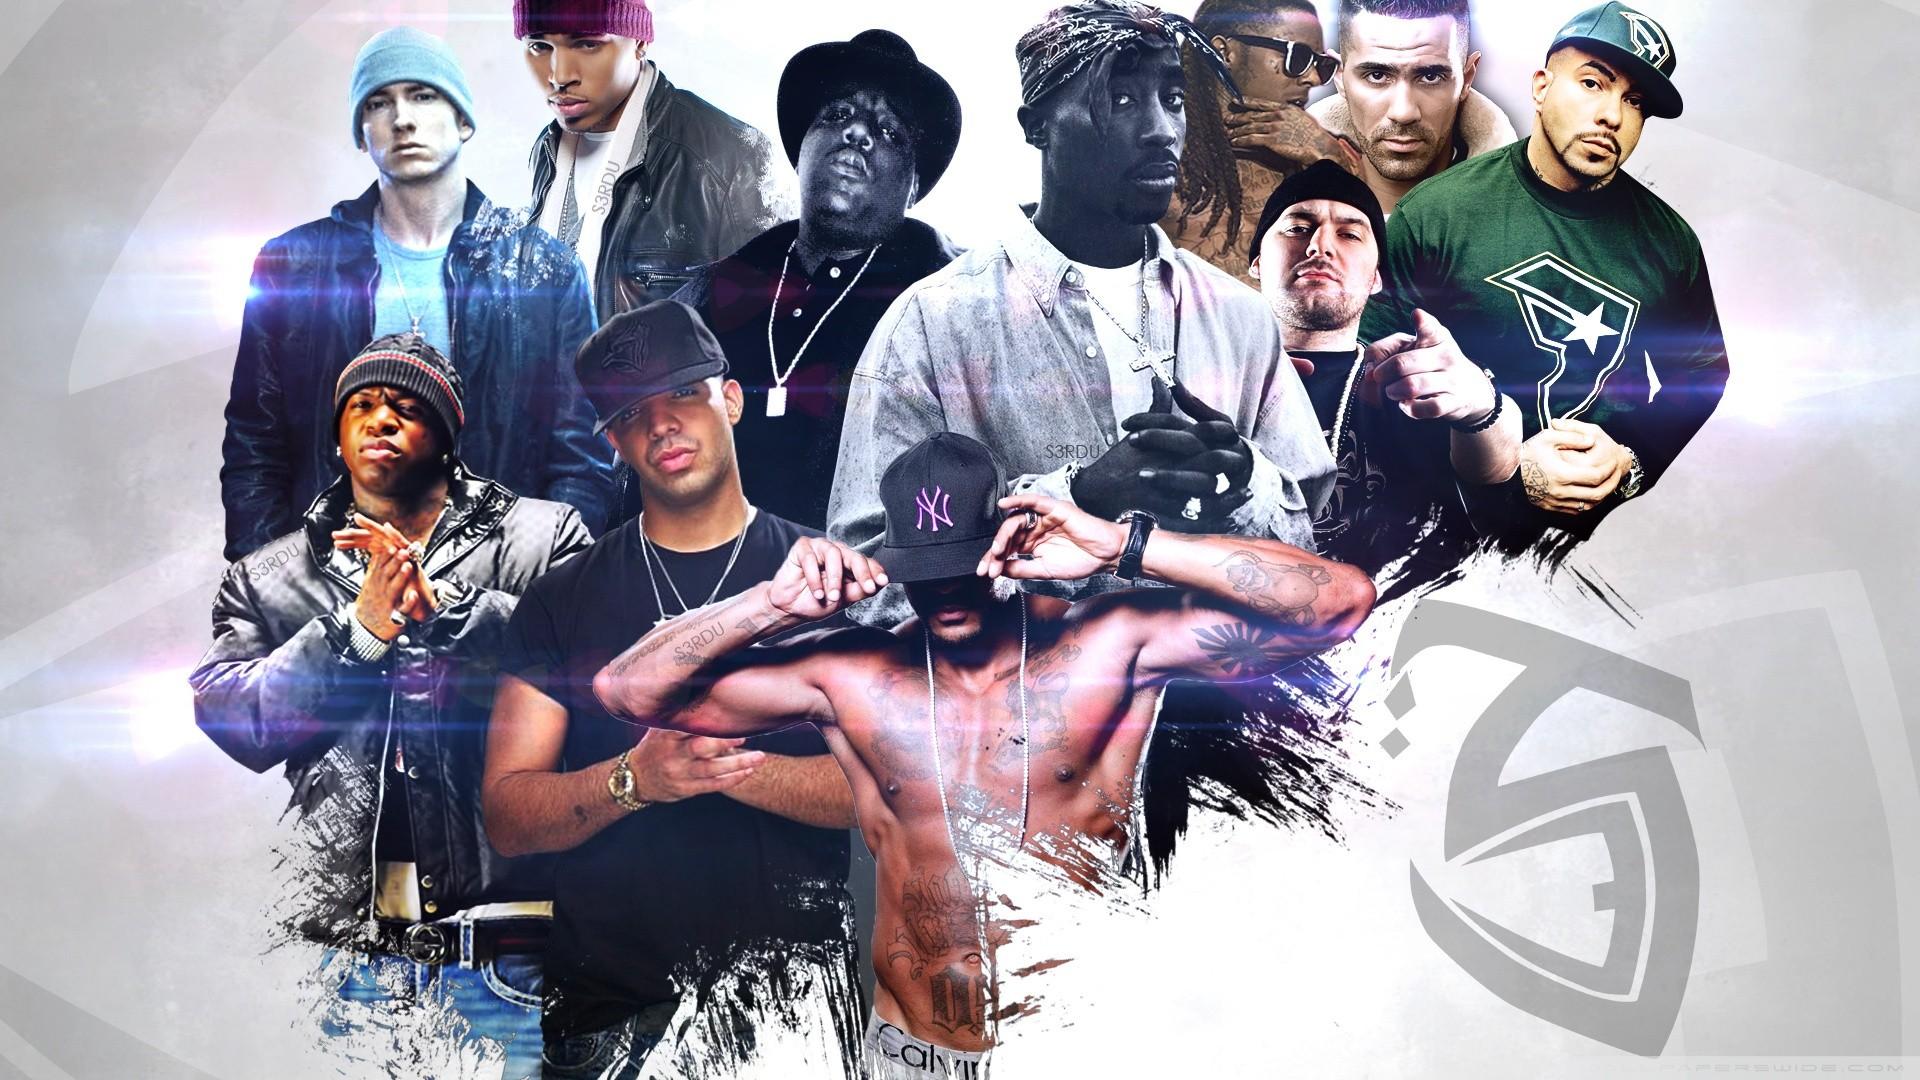 rap 2pac Eminem Lil Wayne Notorious BIG rapper Chris 1920x1080